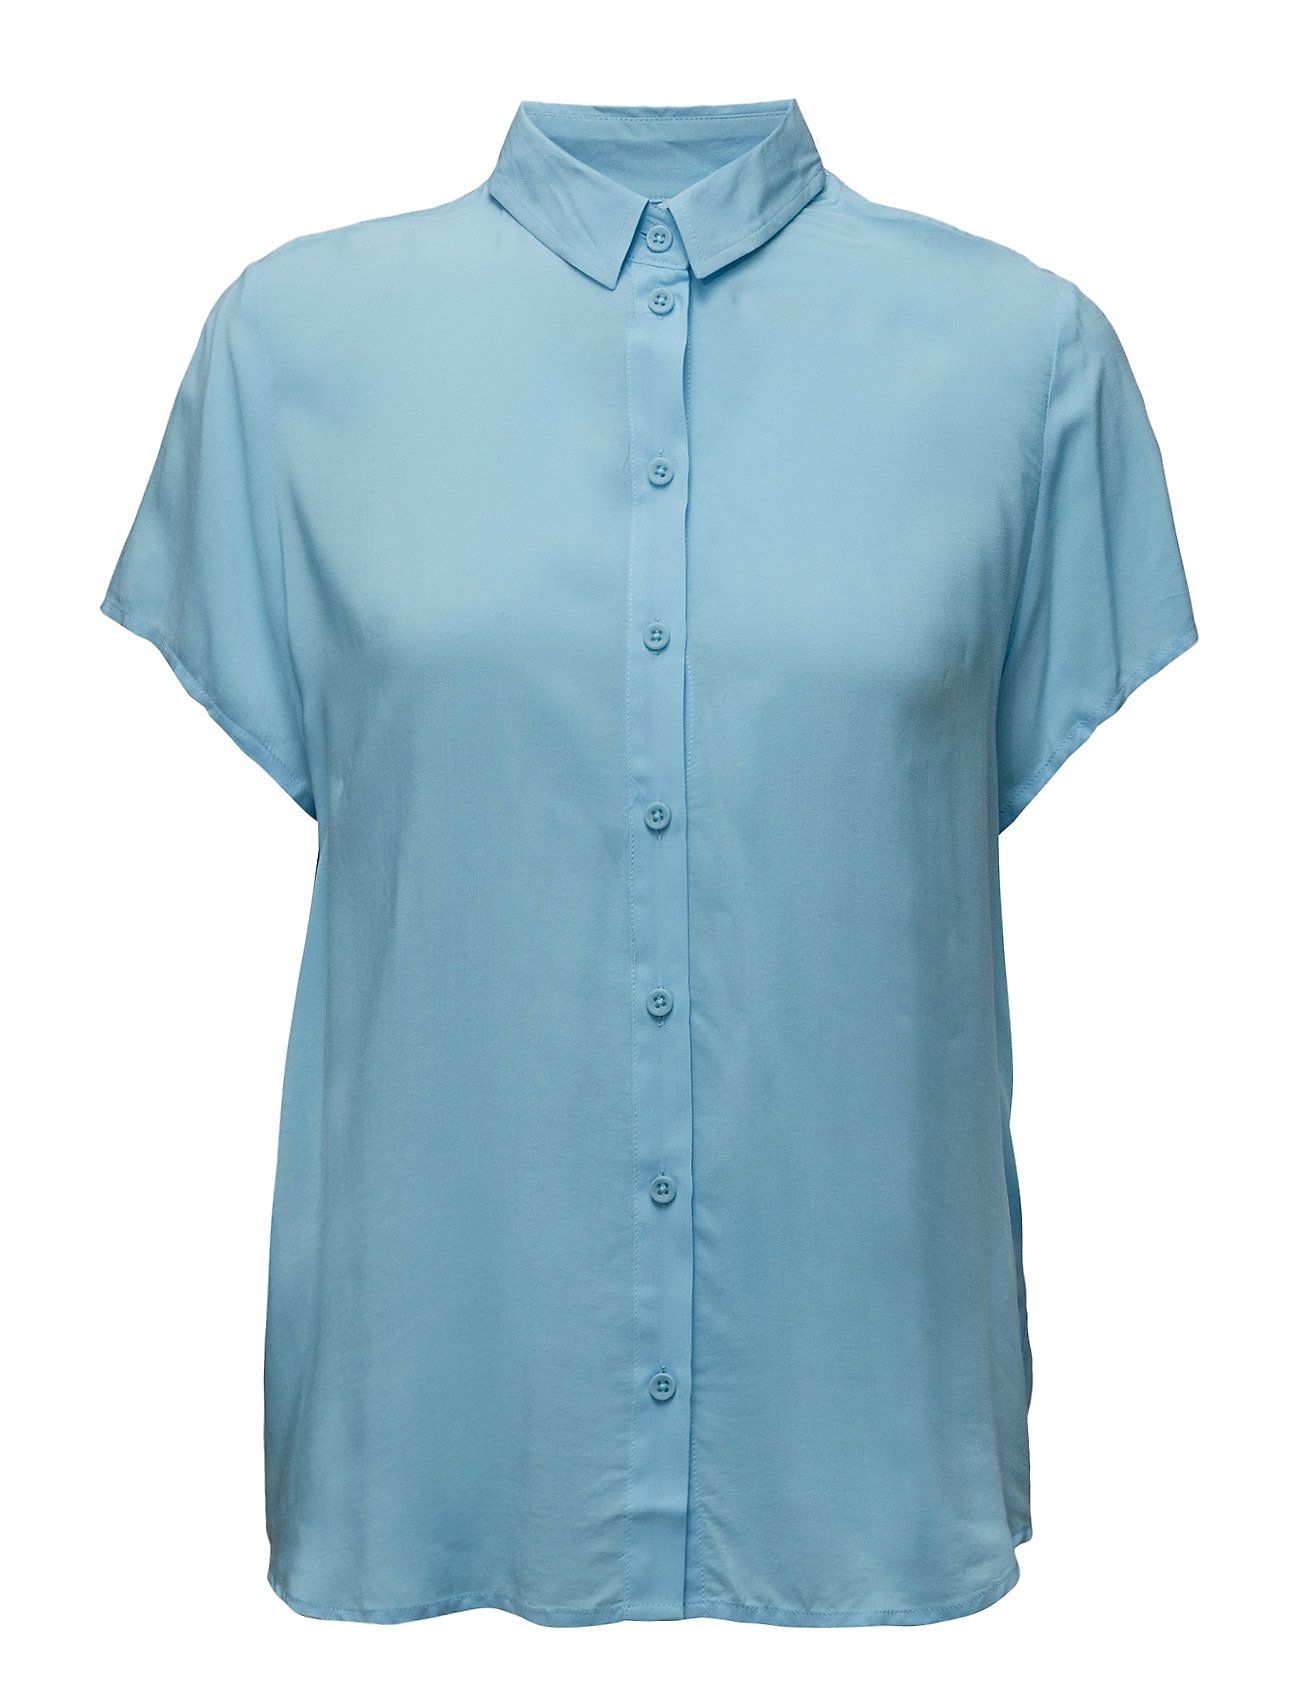 Samsøe & Samsøe Maj ss shirt 3856